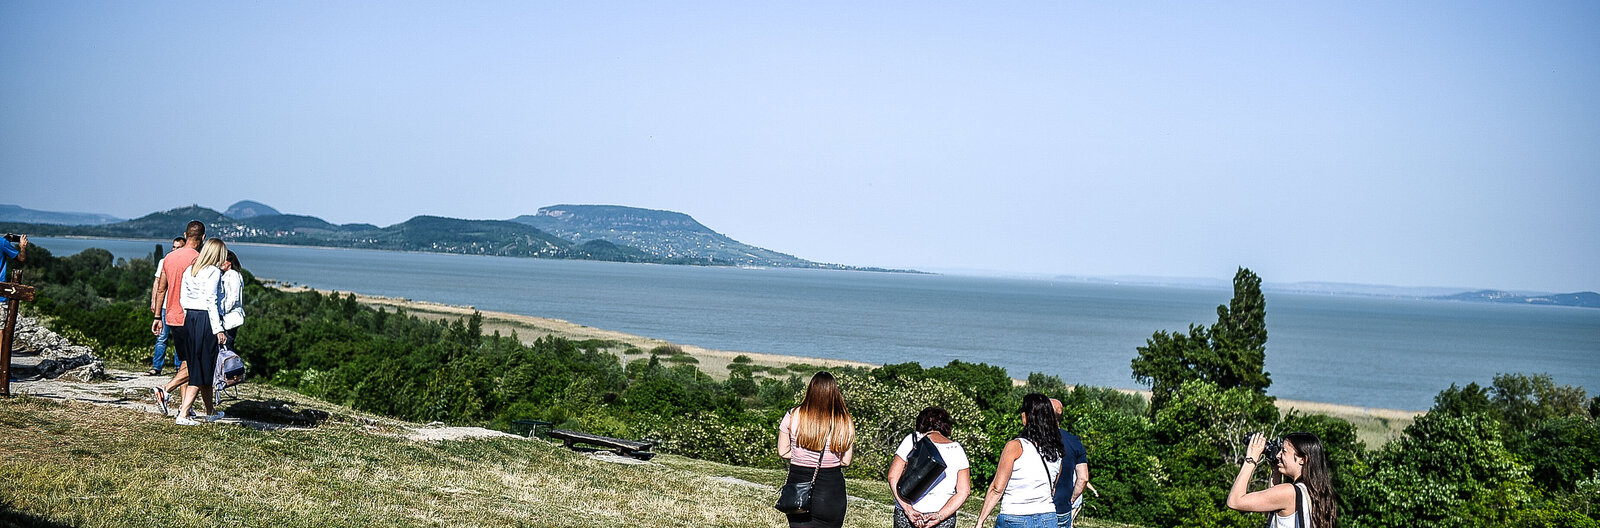 22 things to do around Lake Balaton this spring